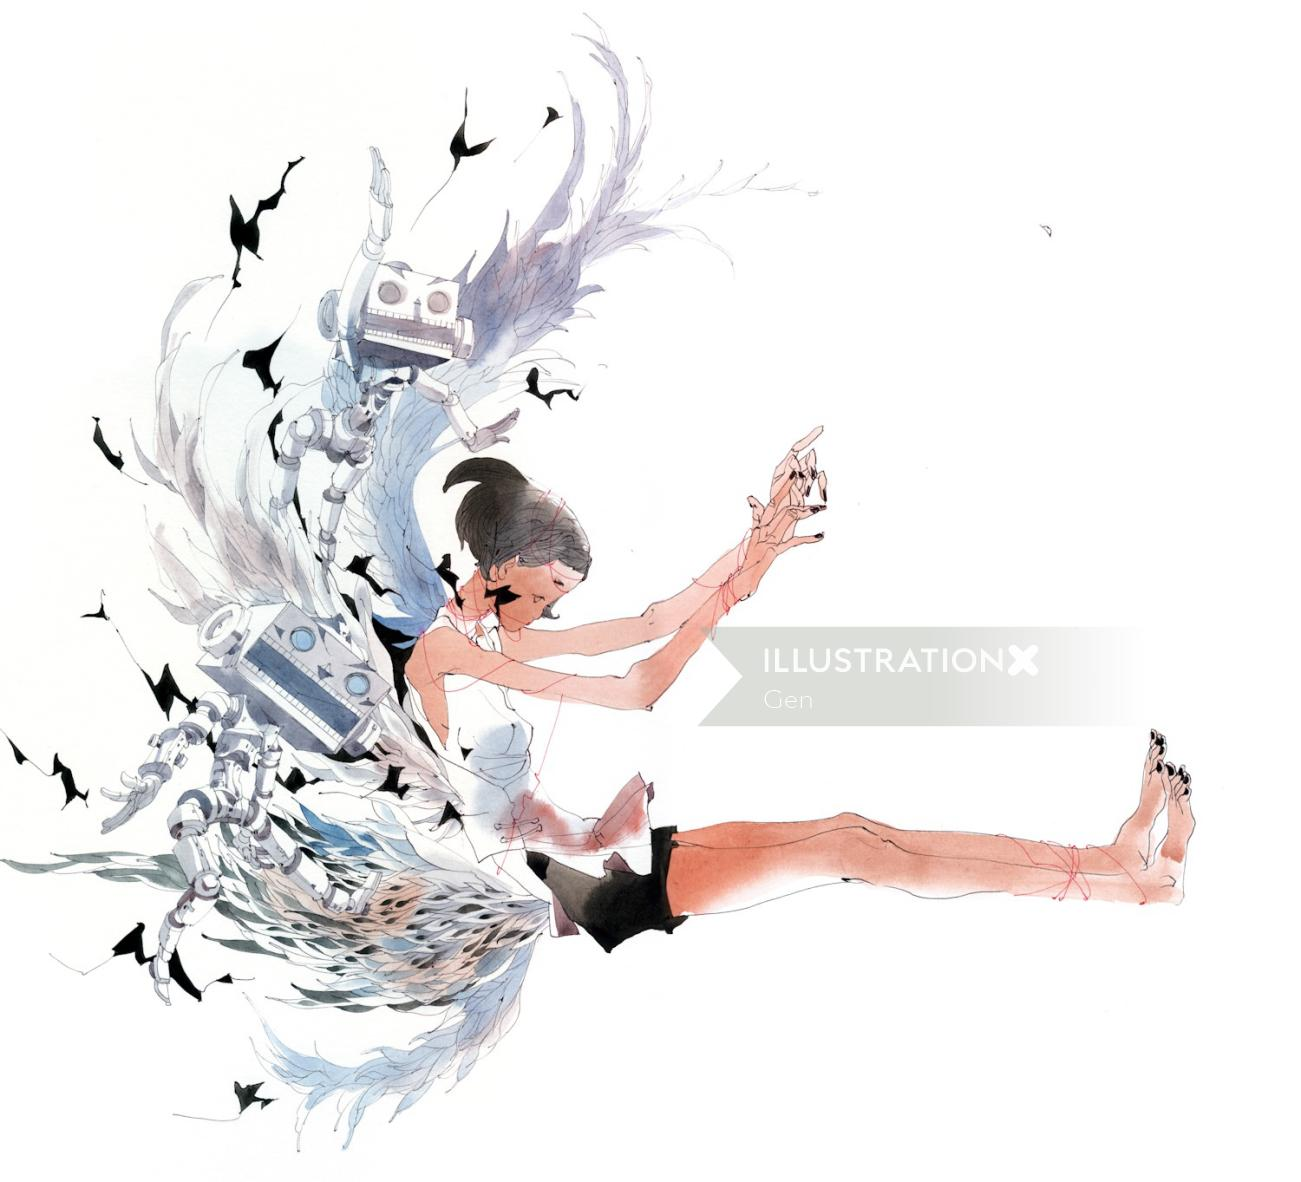 Lady -children's book illustration